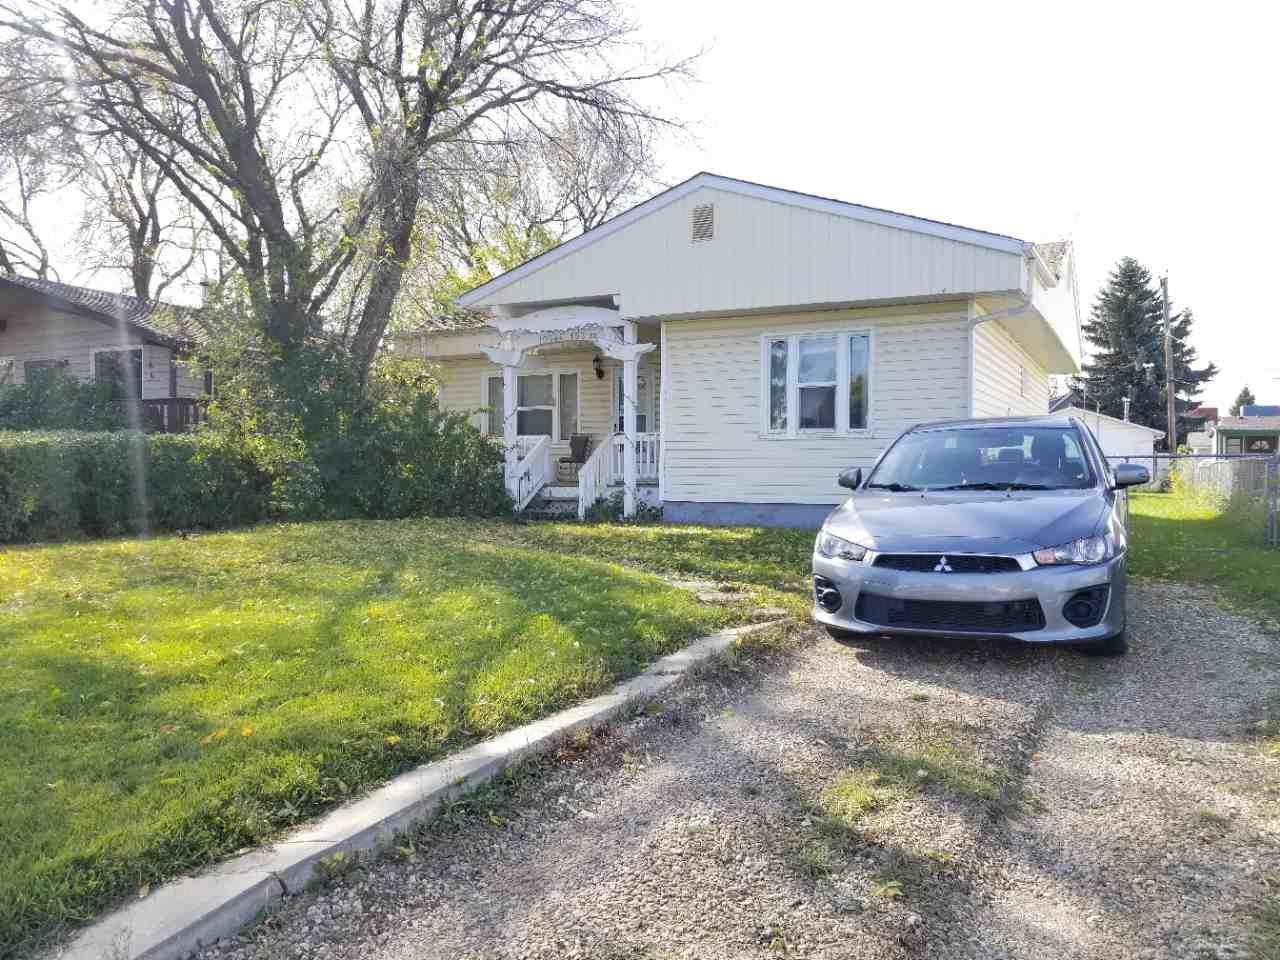 Main Photo: 10744 153 Street in Edmonton: Zone 21 House for sale : MLS®# E4176054